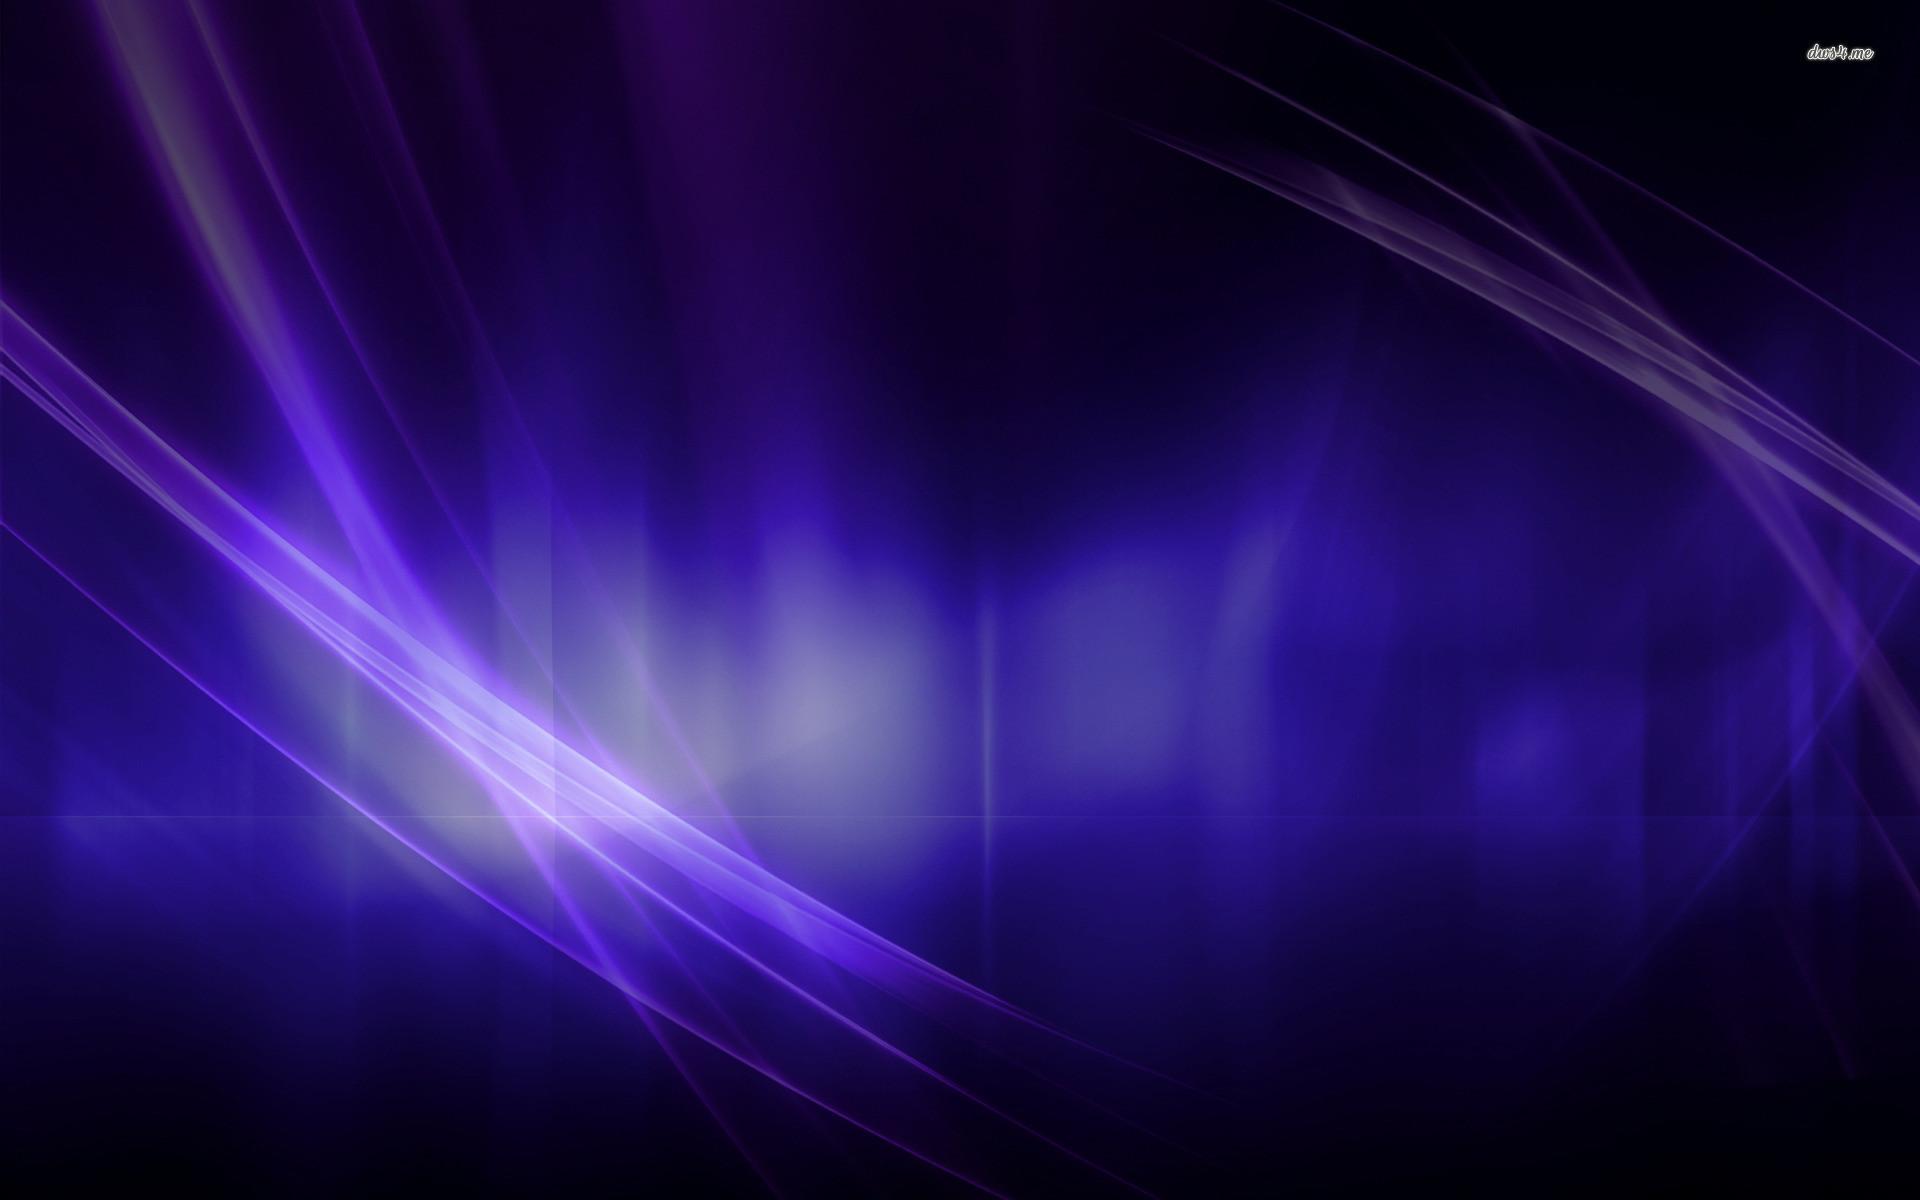 Purple Wallpapers 12 Best Wallpapers Collection Desktop: Purple Abstract Wallpaper (74+ Images